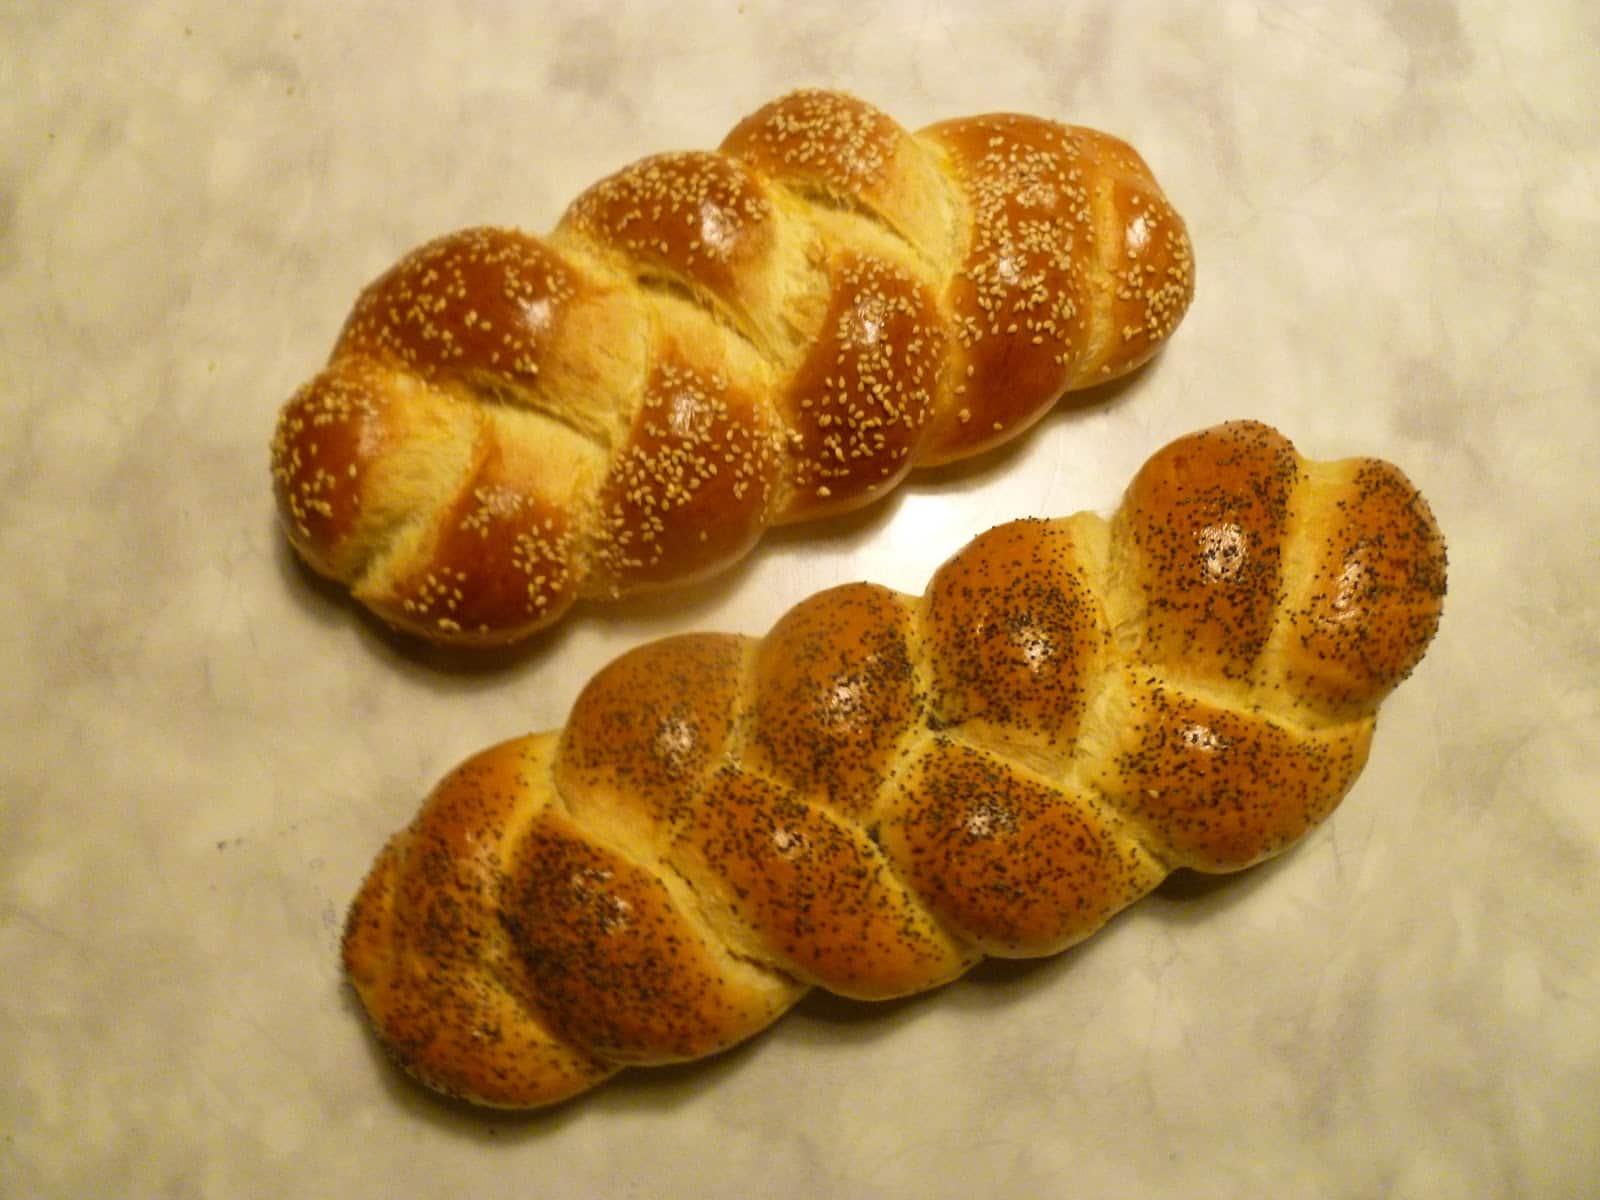 gist-03-baking-soda-nl